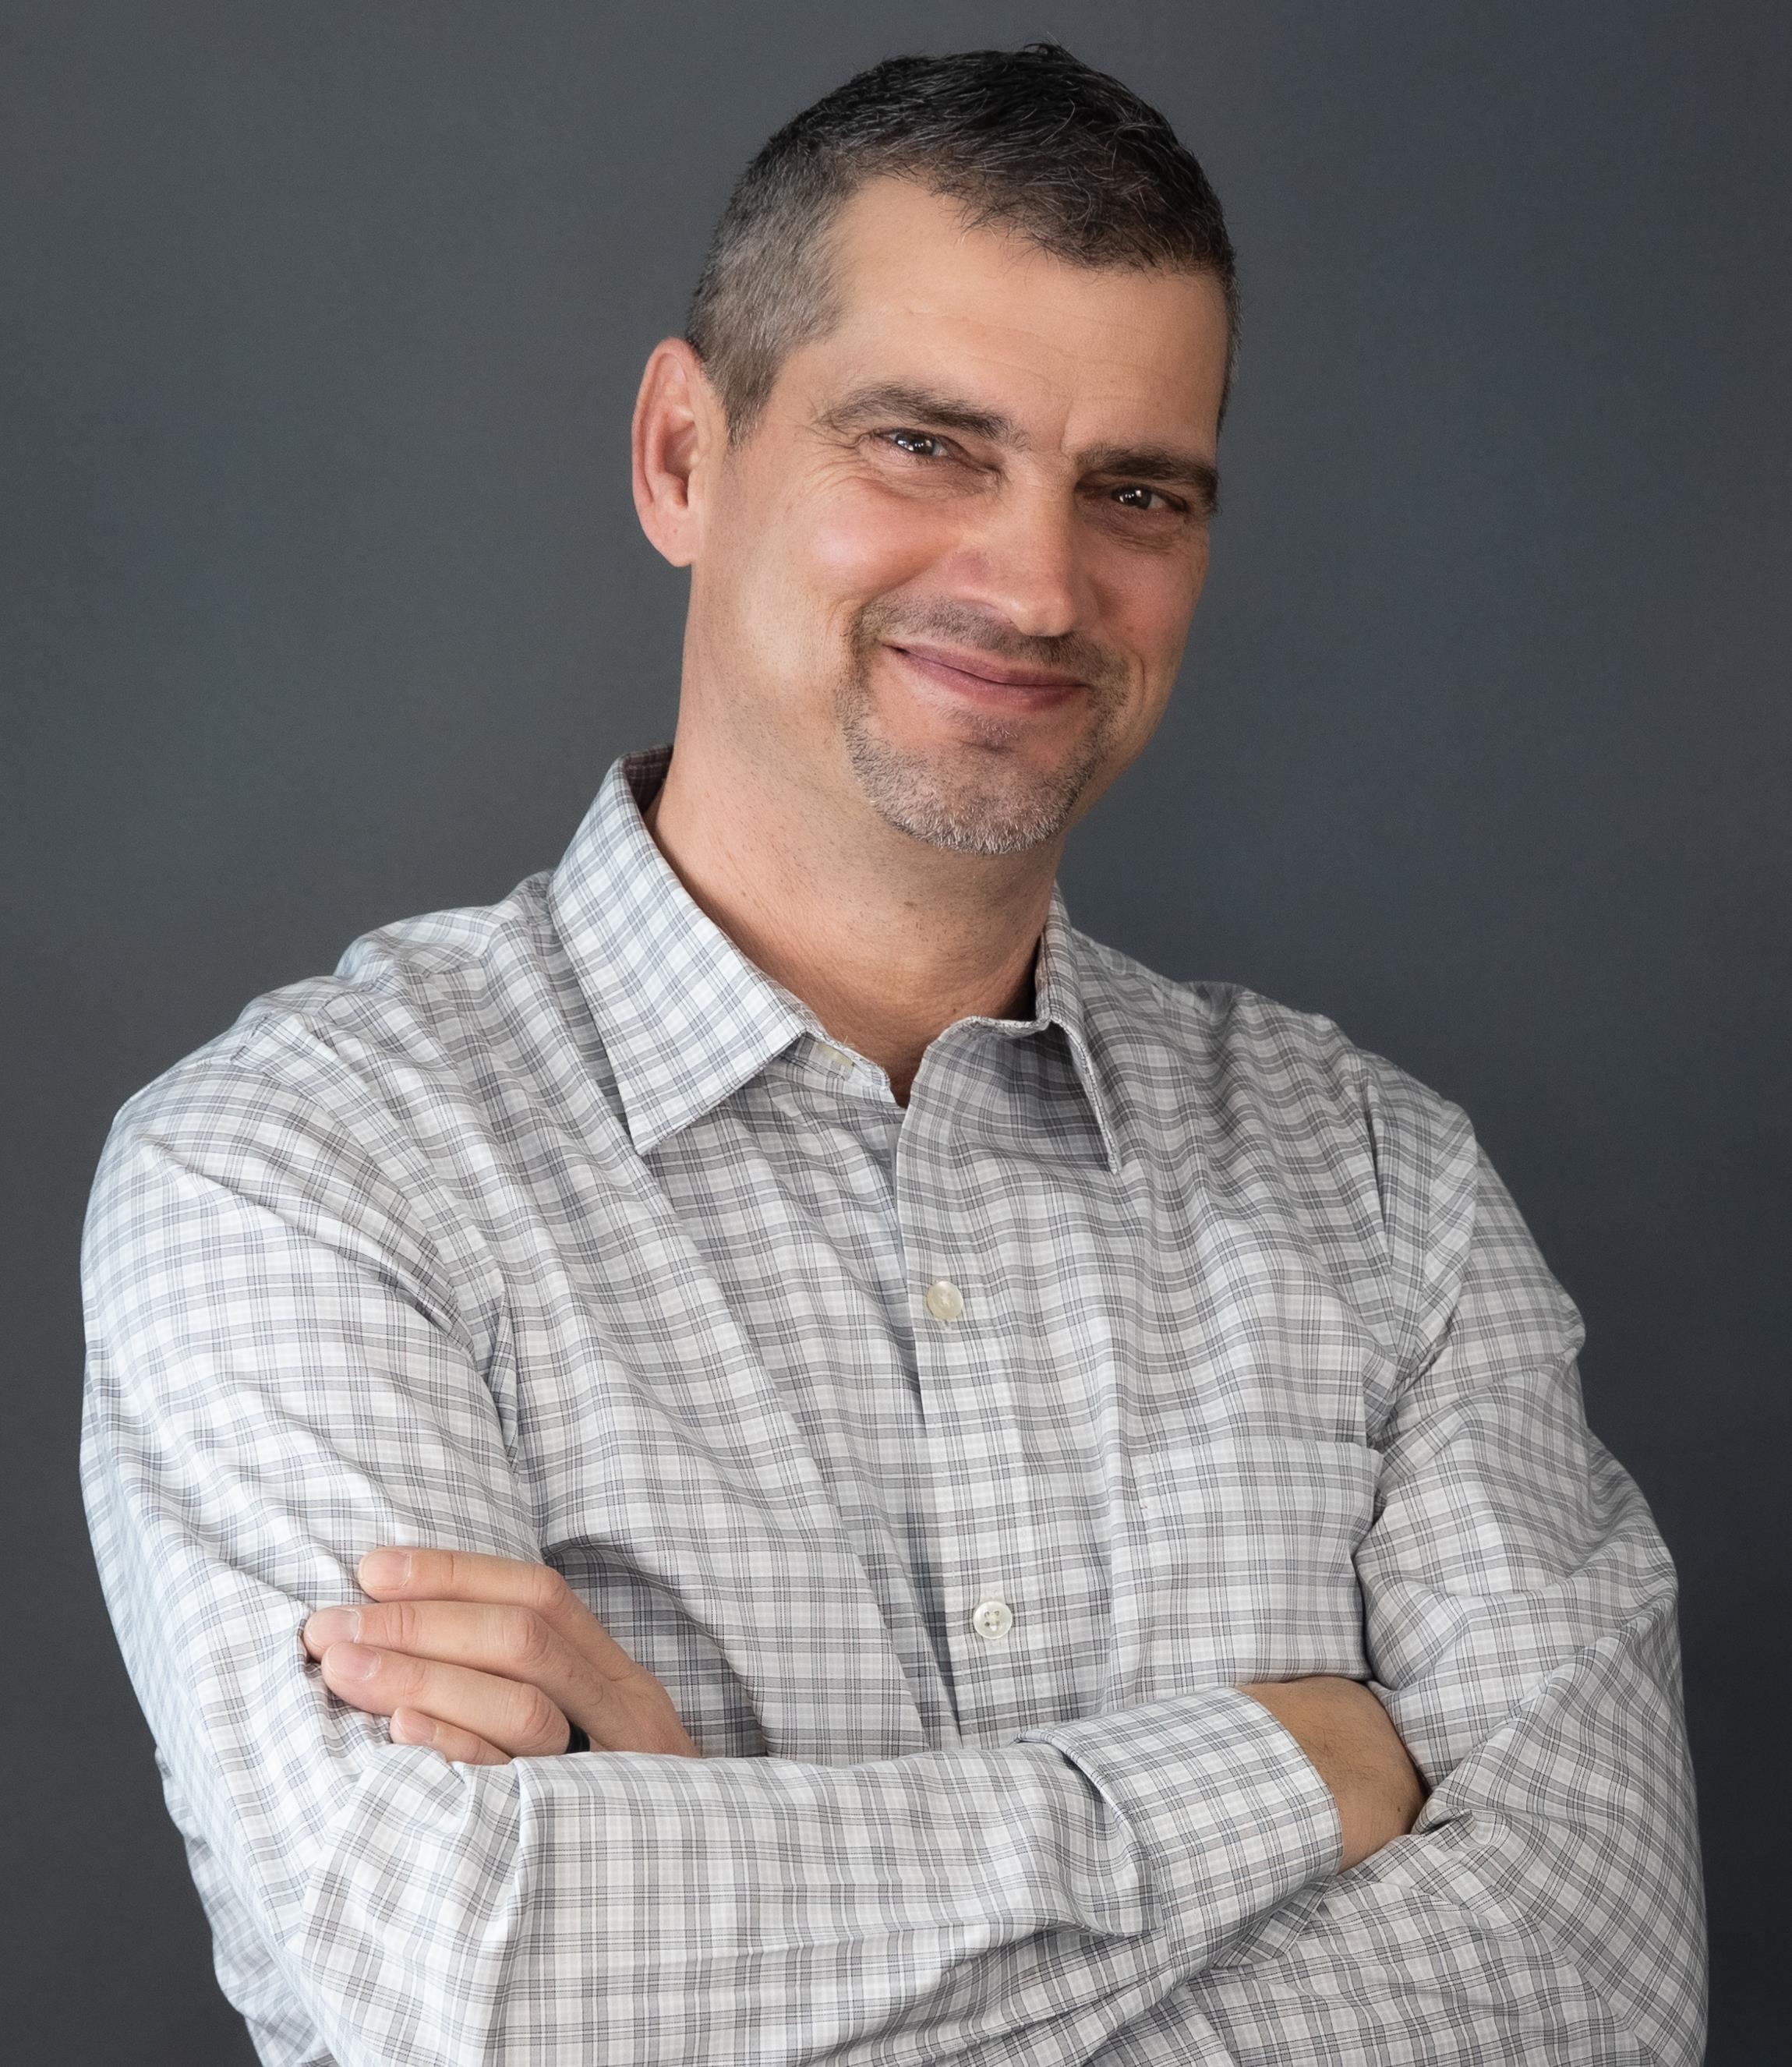 Patrick Siemens